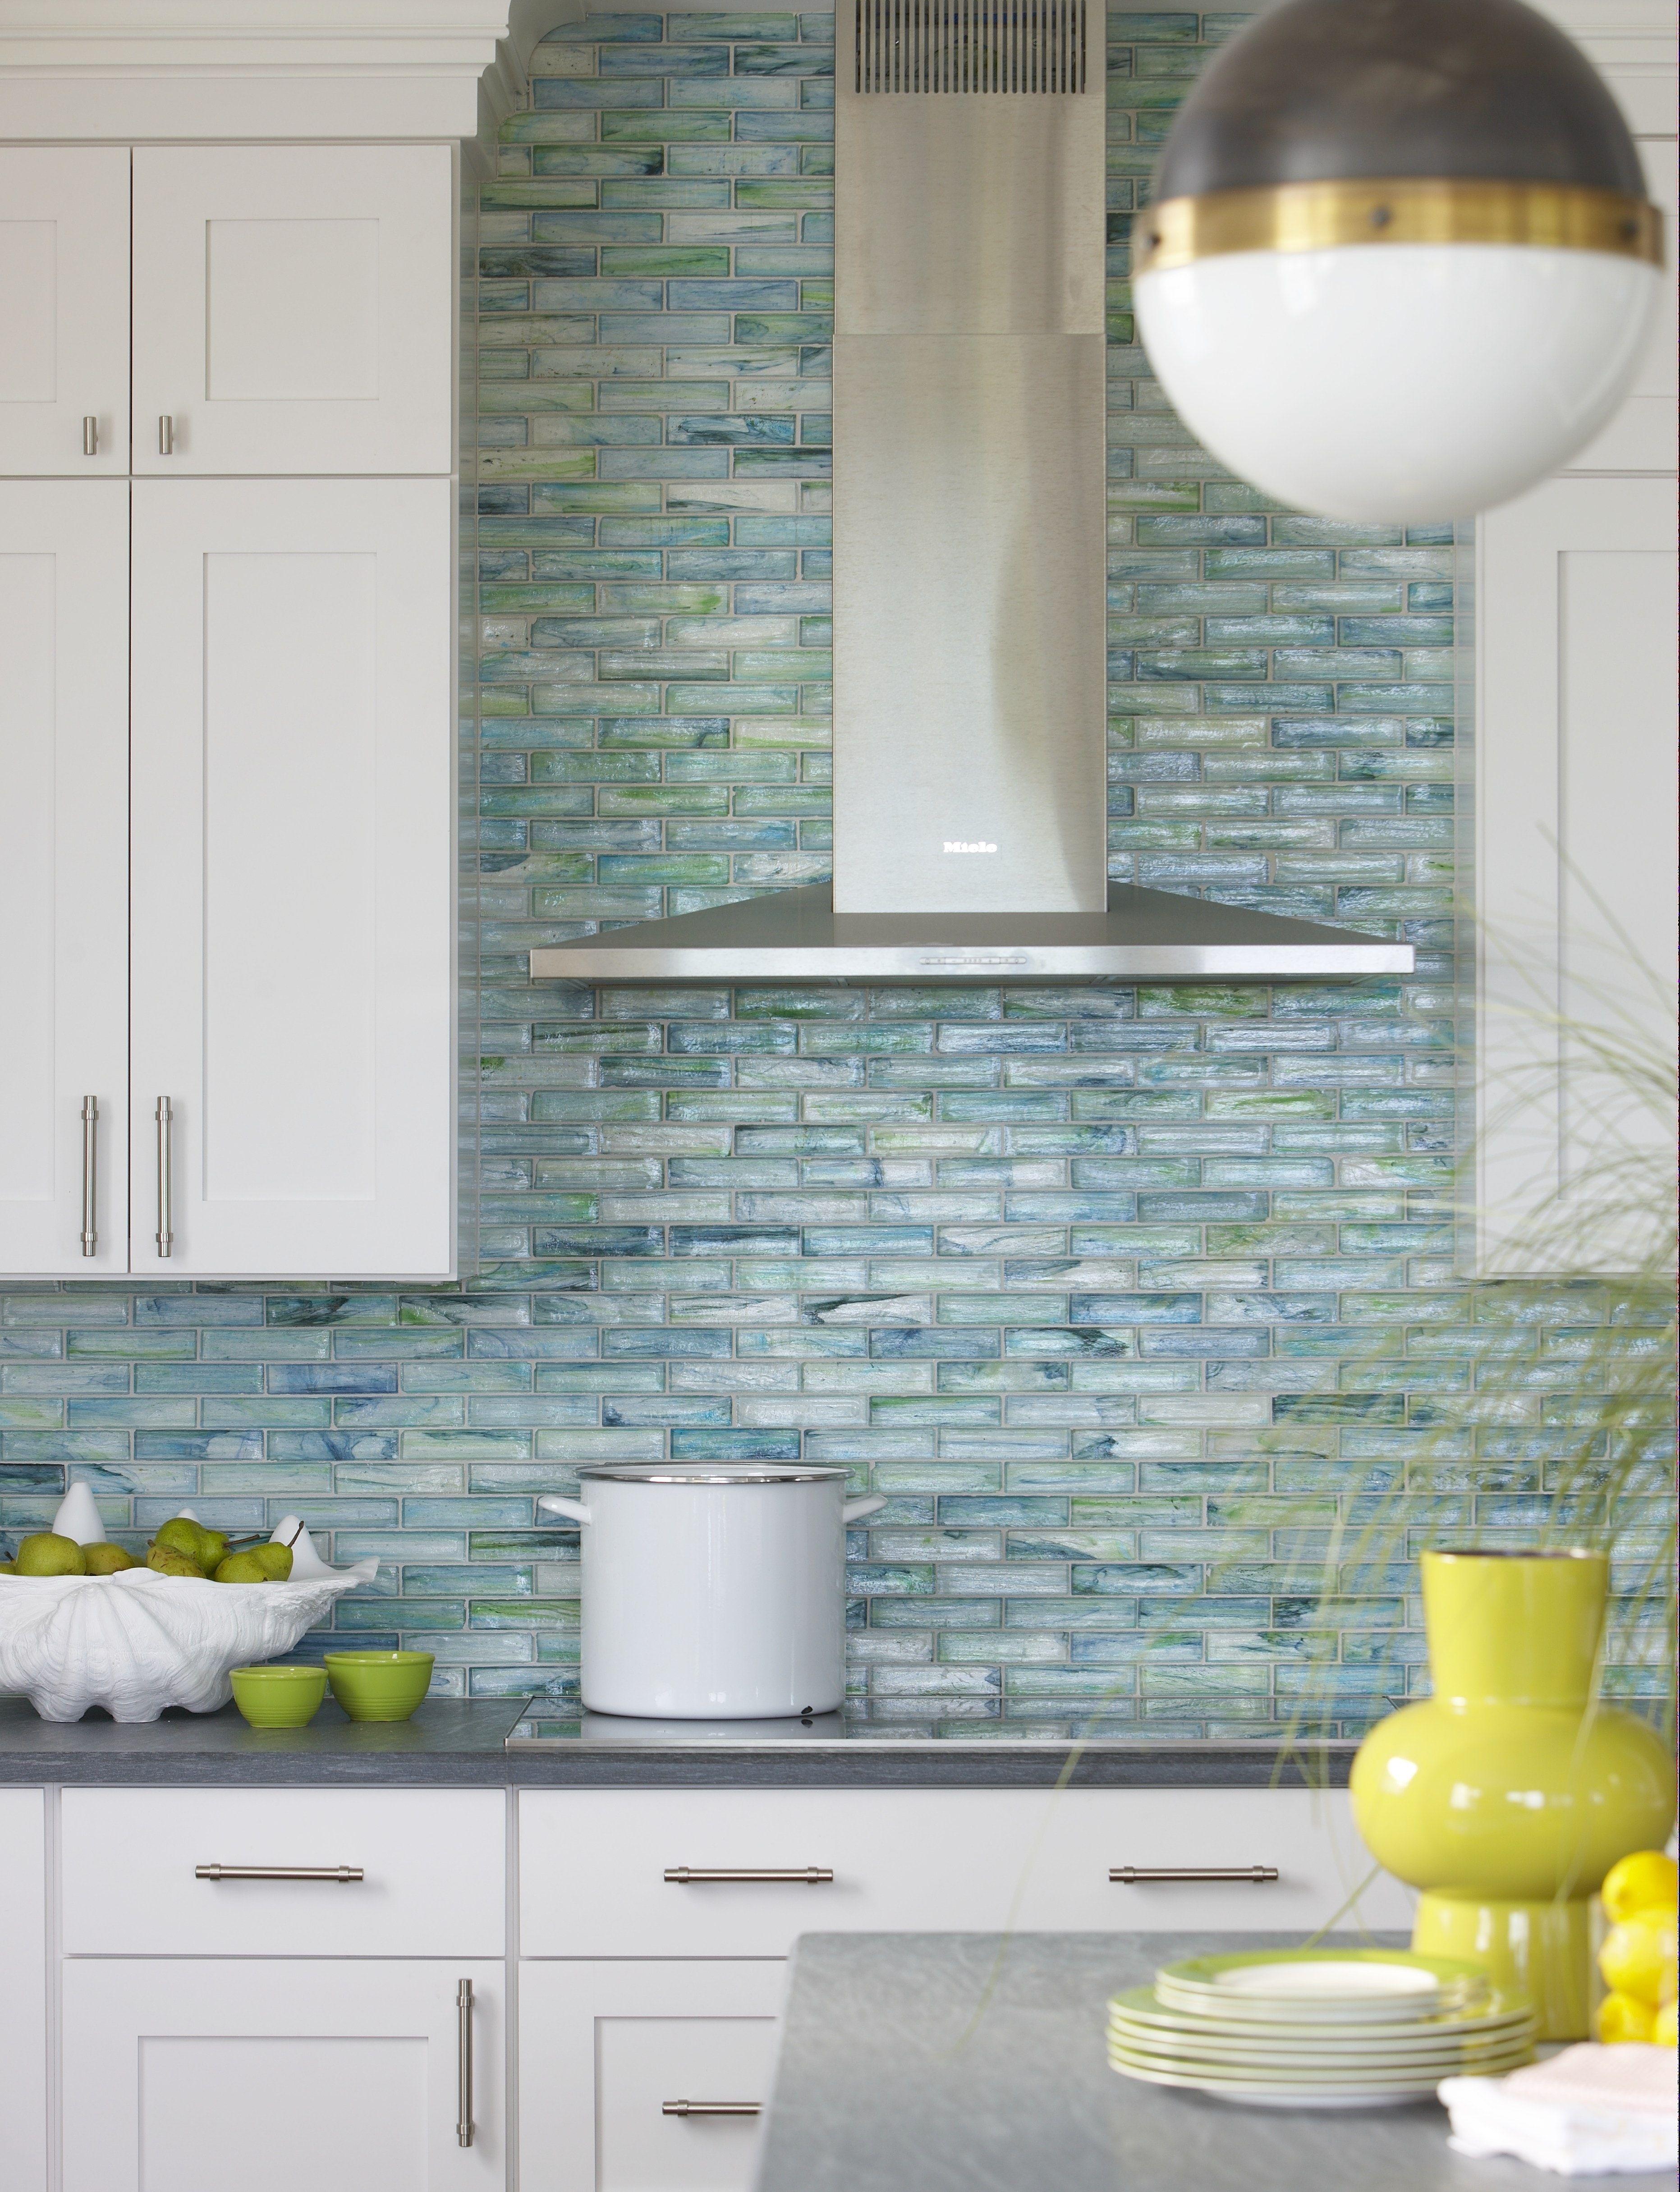 Coastal Beach House Kitchen With Watery Blue Green Glass Tile And Pietra Cardosa Beach House Kitchens Beach Kitchens Coastal Kitchen